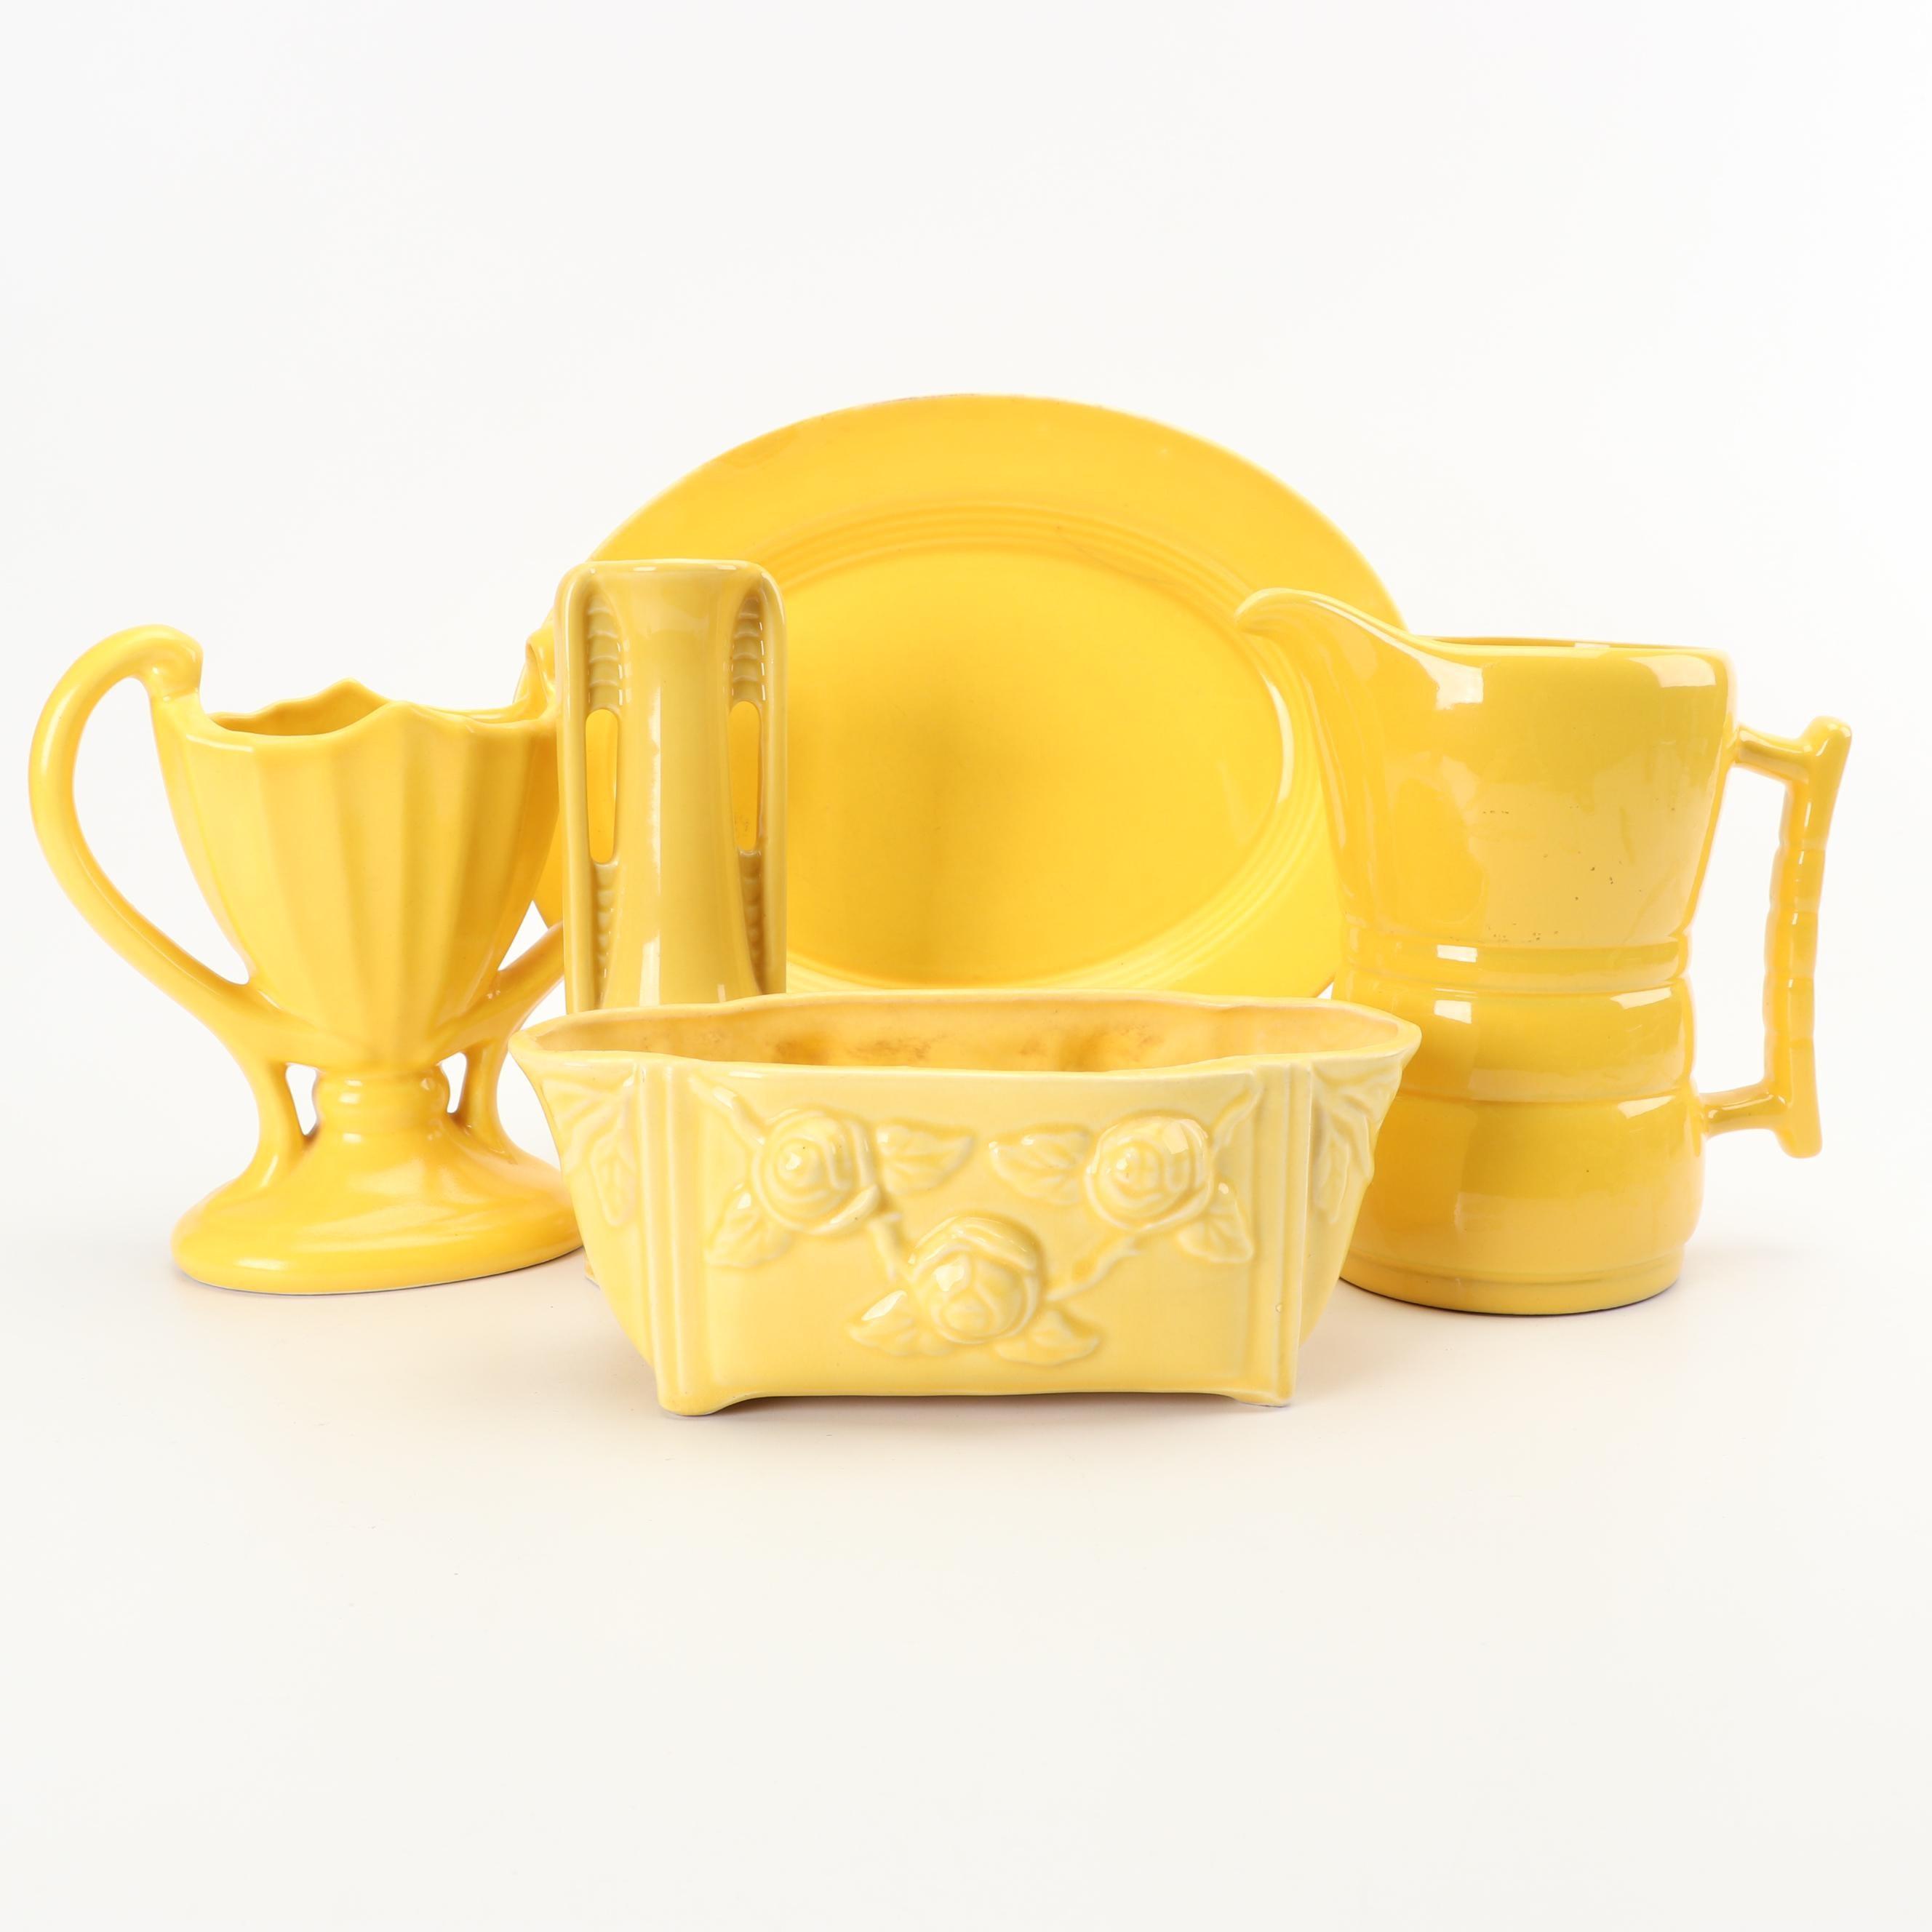 Frankoma, Shawnee, Camark and Other Yellow Ceramic Pottery